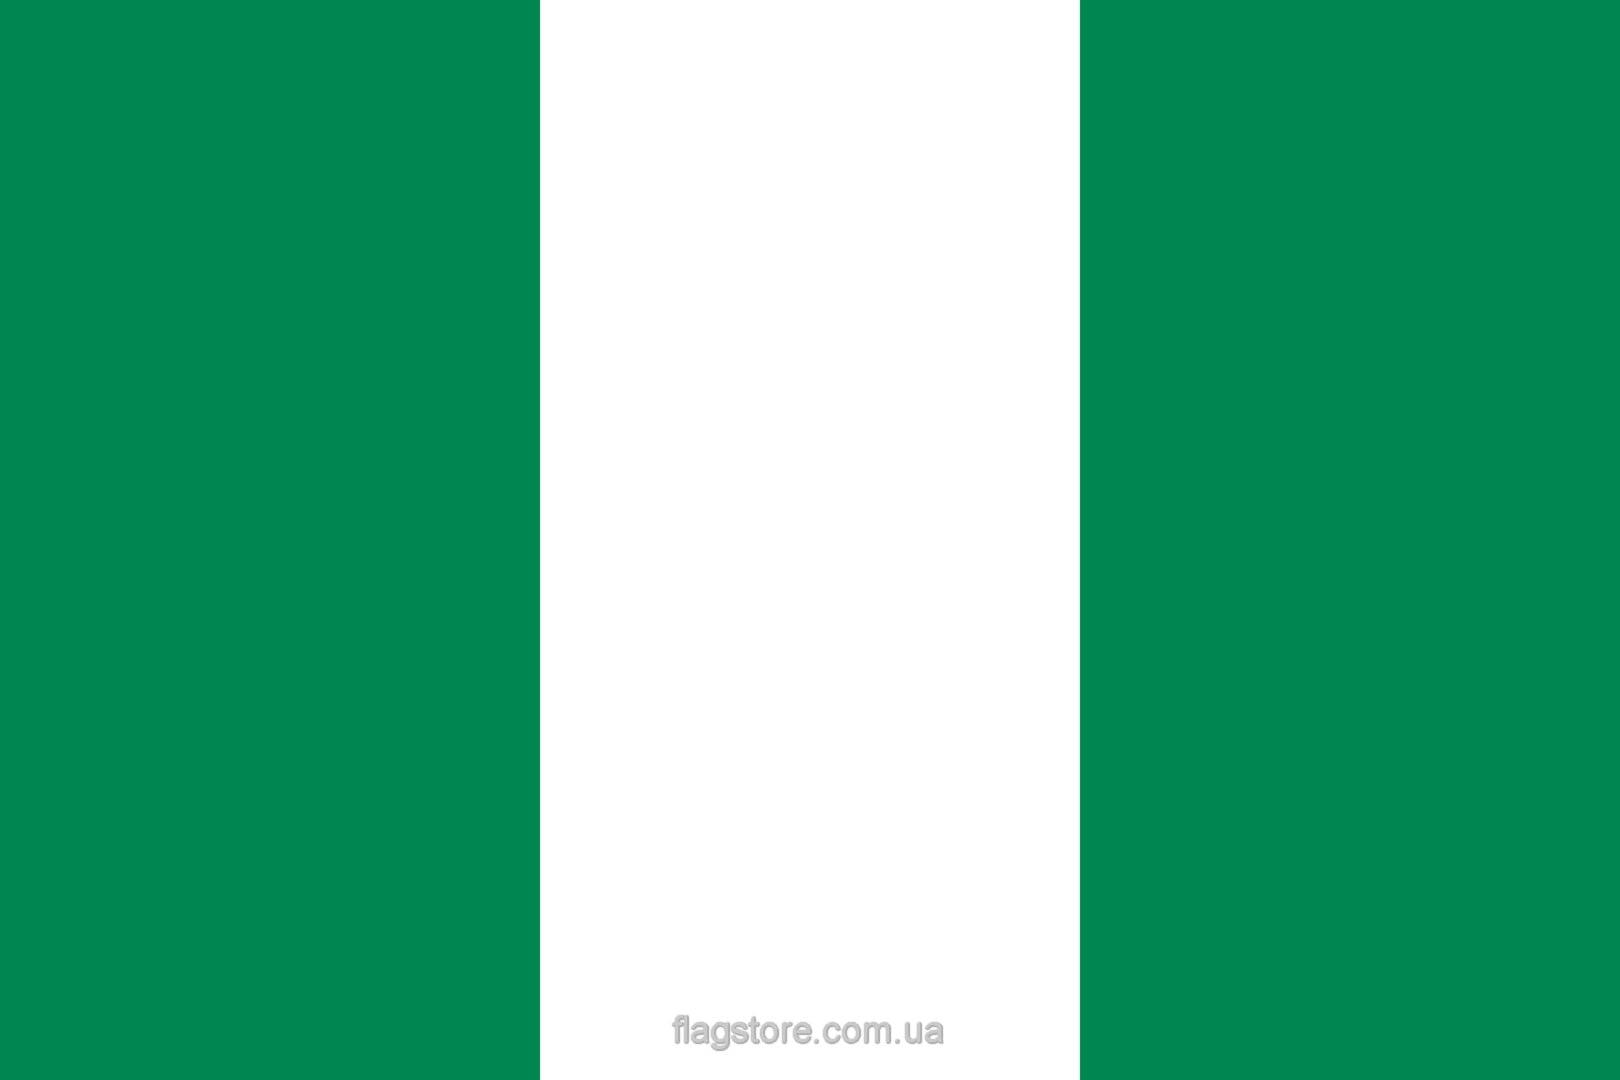 Купить флаг Нигерии (страны Нигерия)